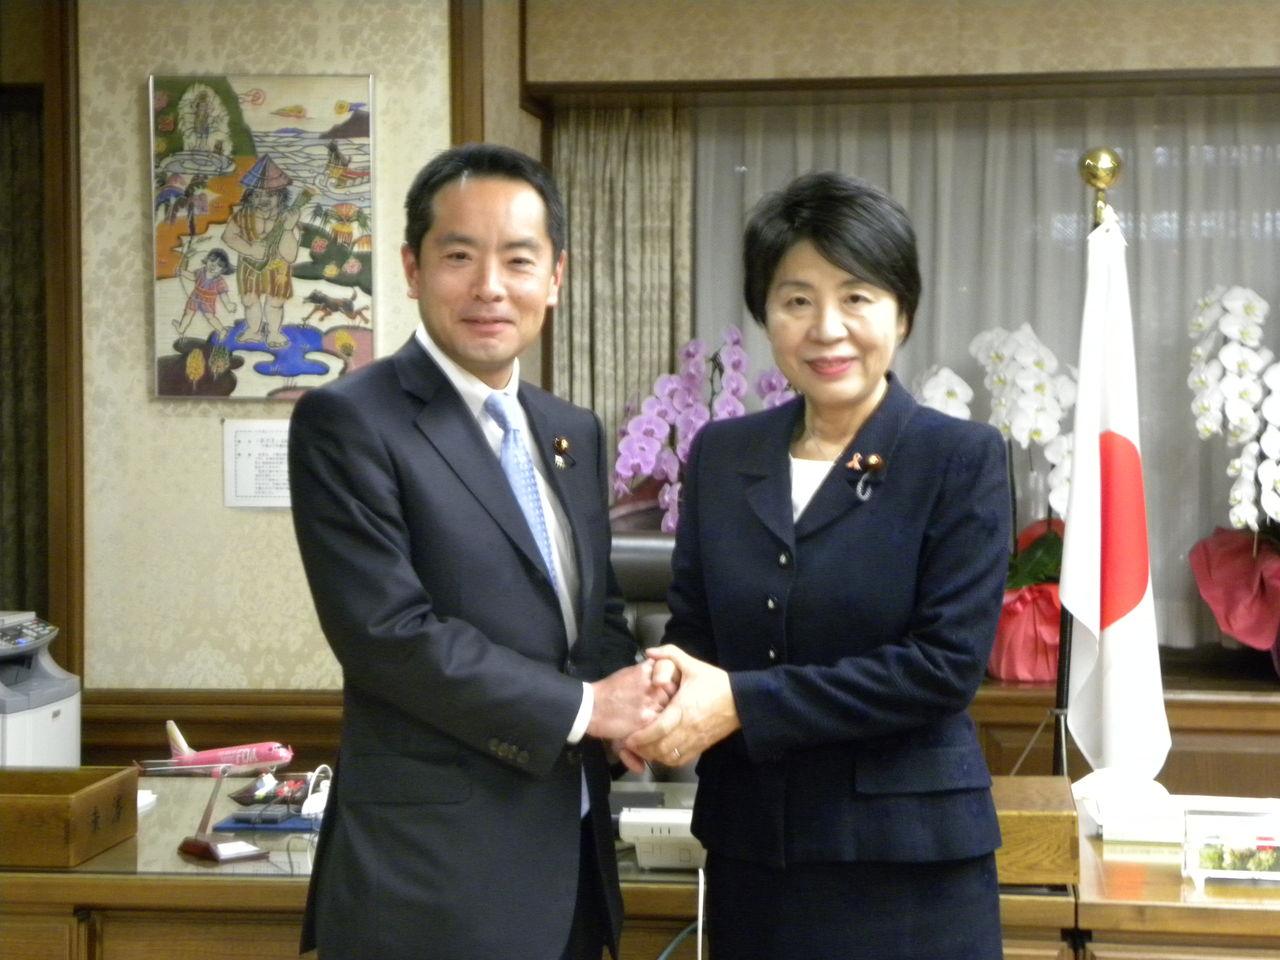 2062 上川陽子法務大臣と : 衆議院議員 井上信治の活動報告